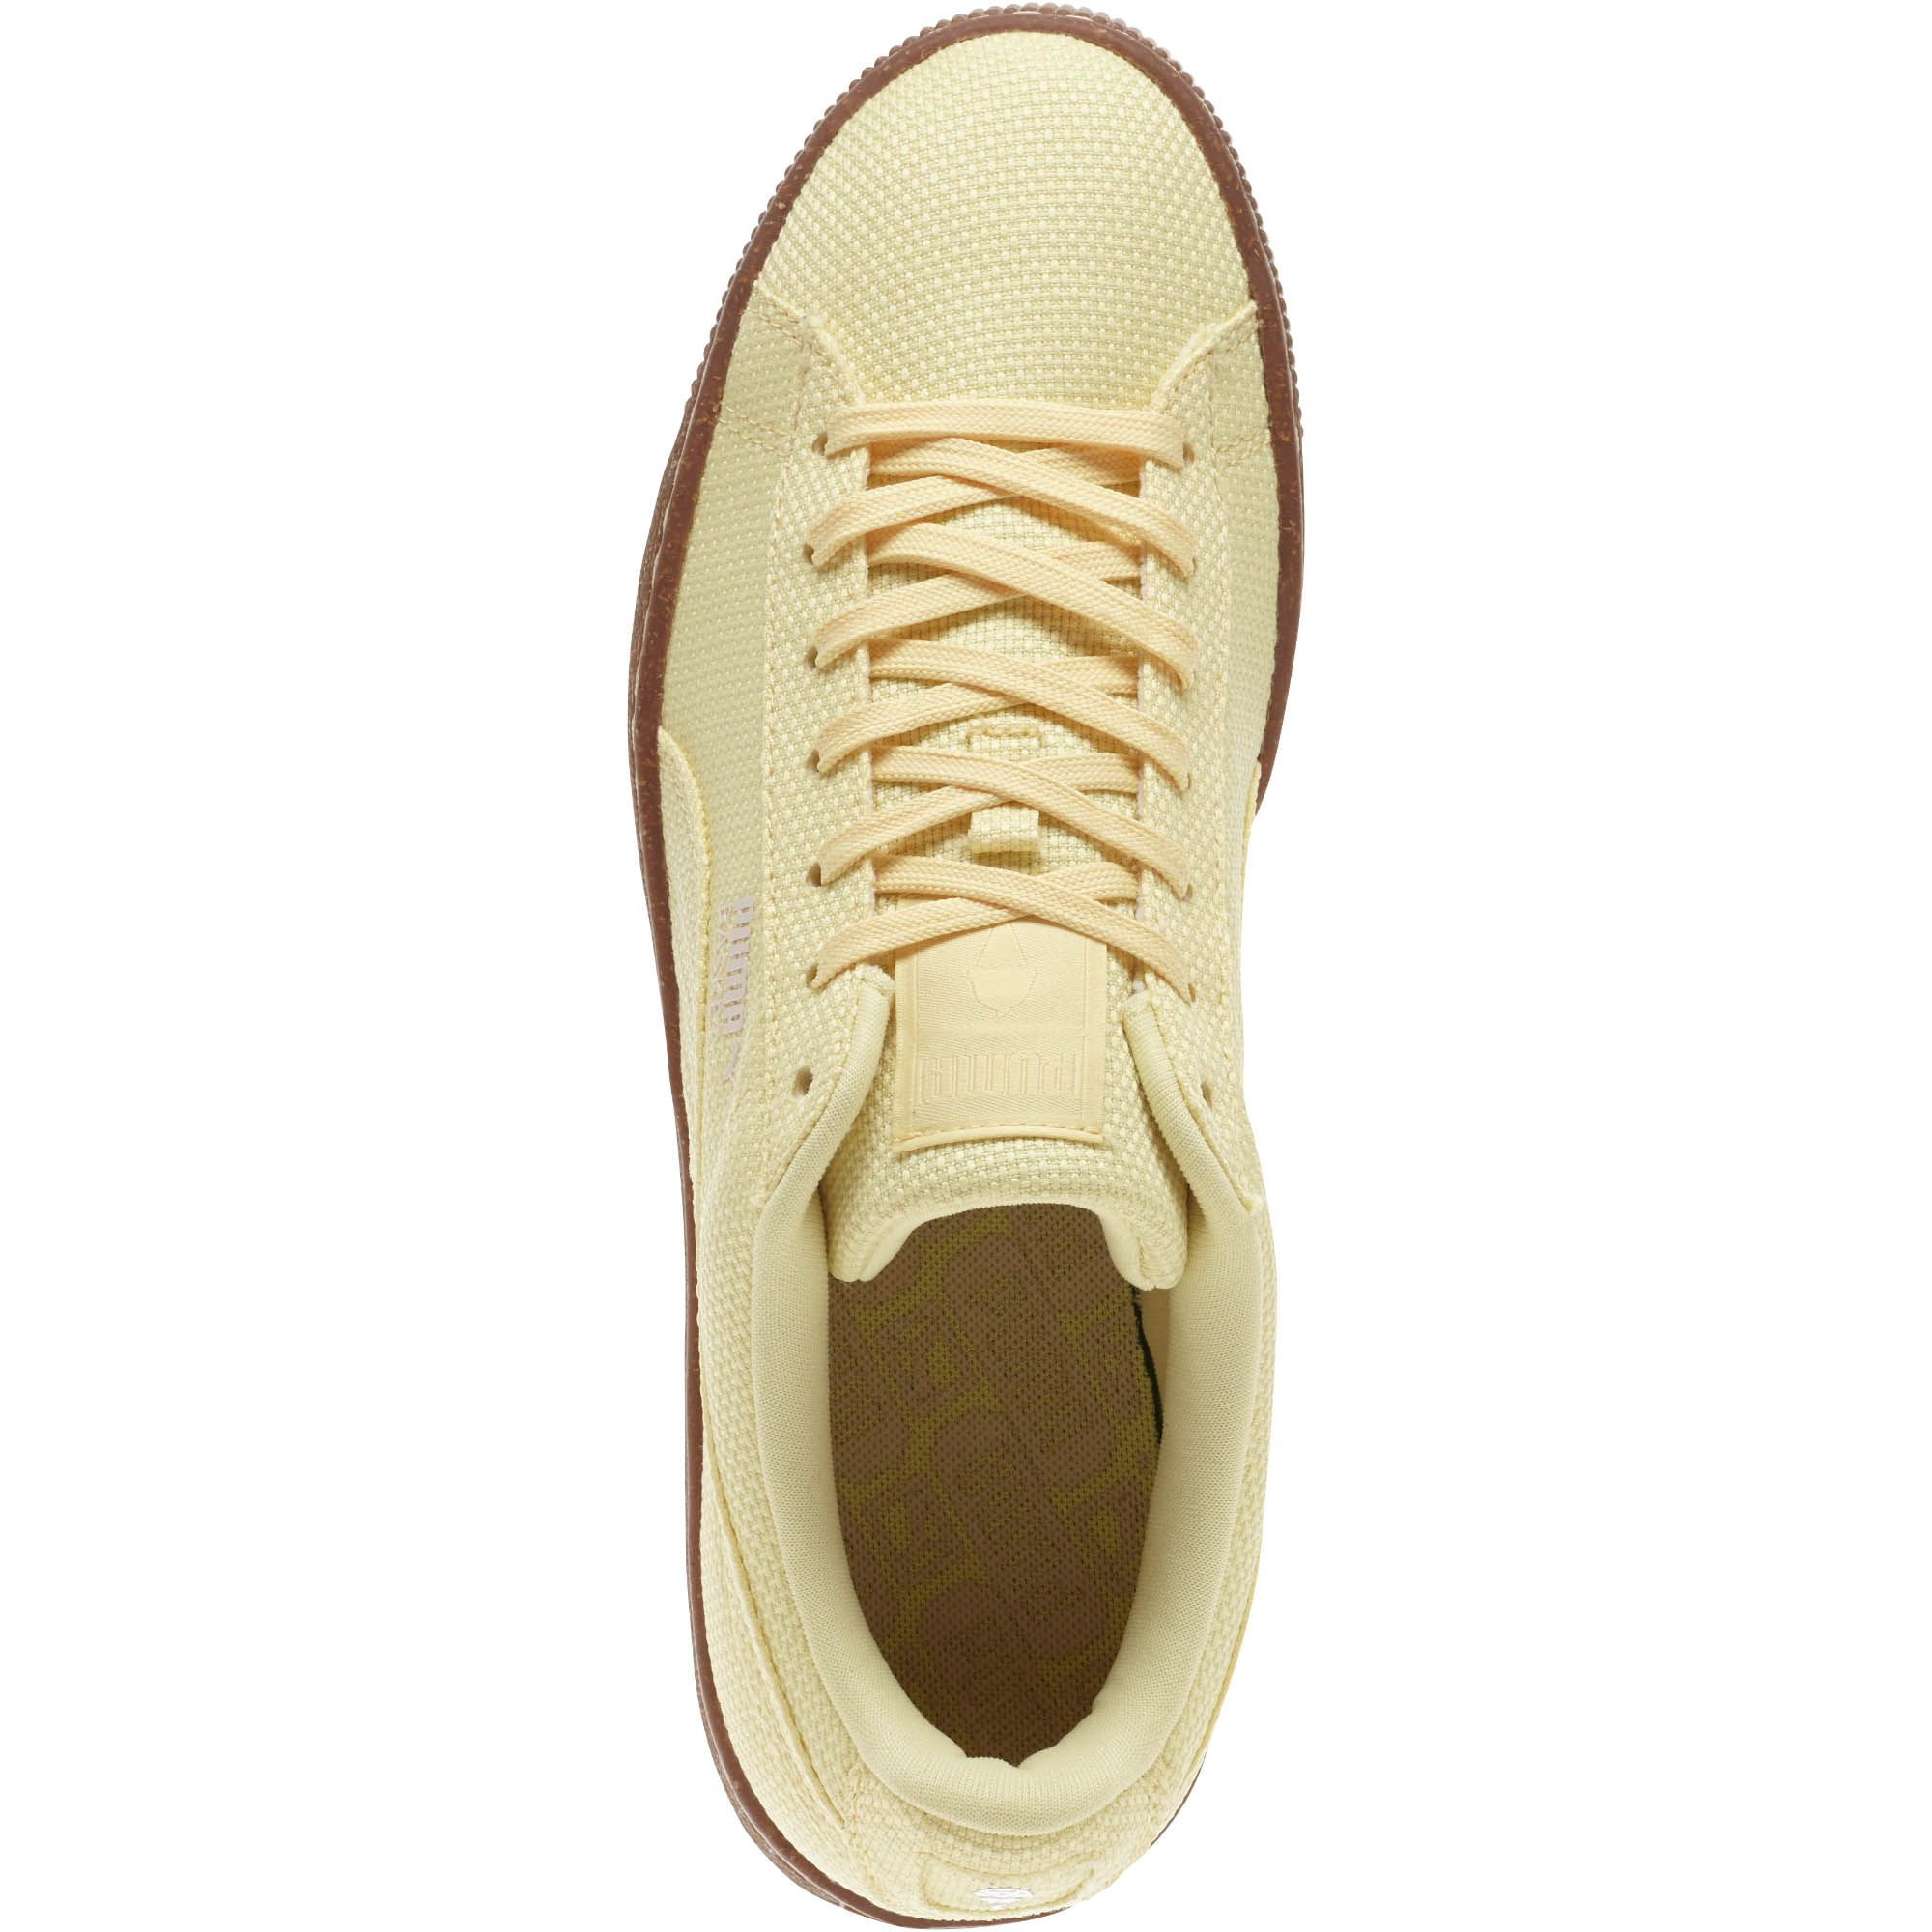 bd415f71cd9 Lyst - PUMA Basket Ripstop Ice Cream Men s Sneakers for Men